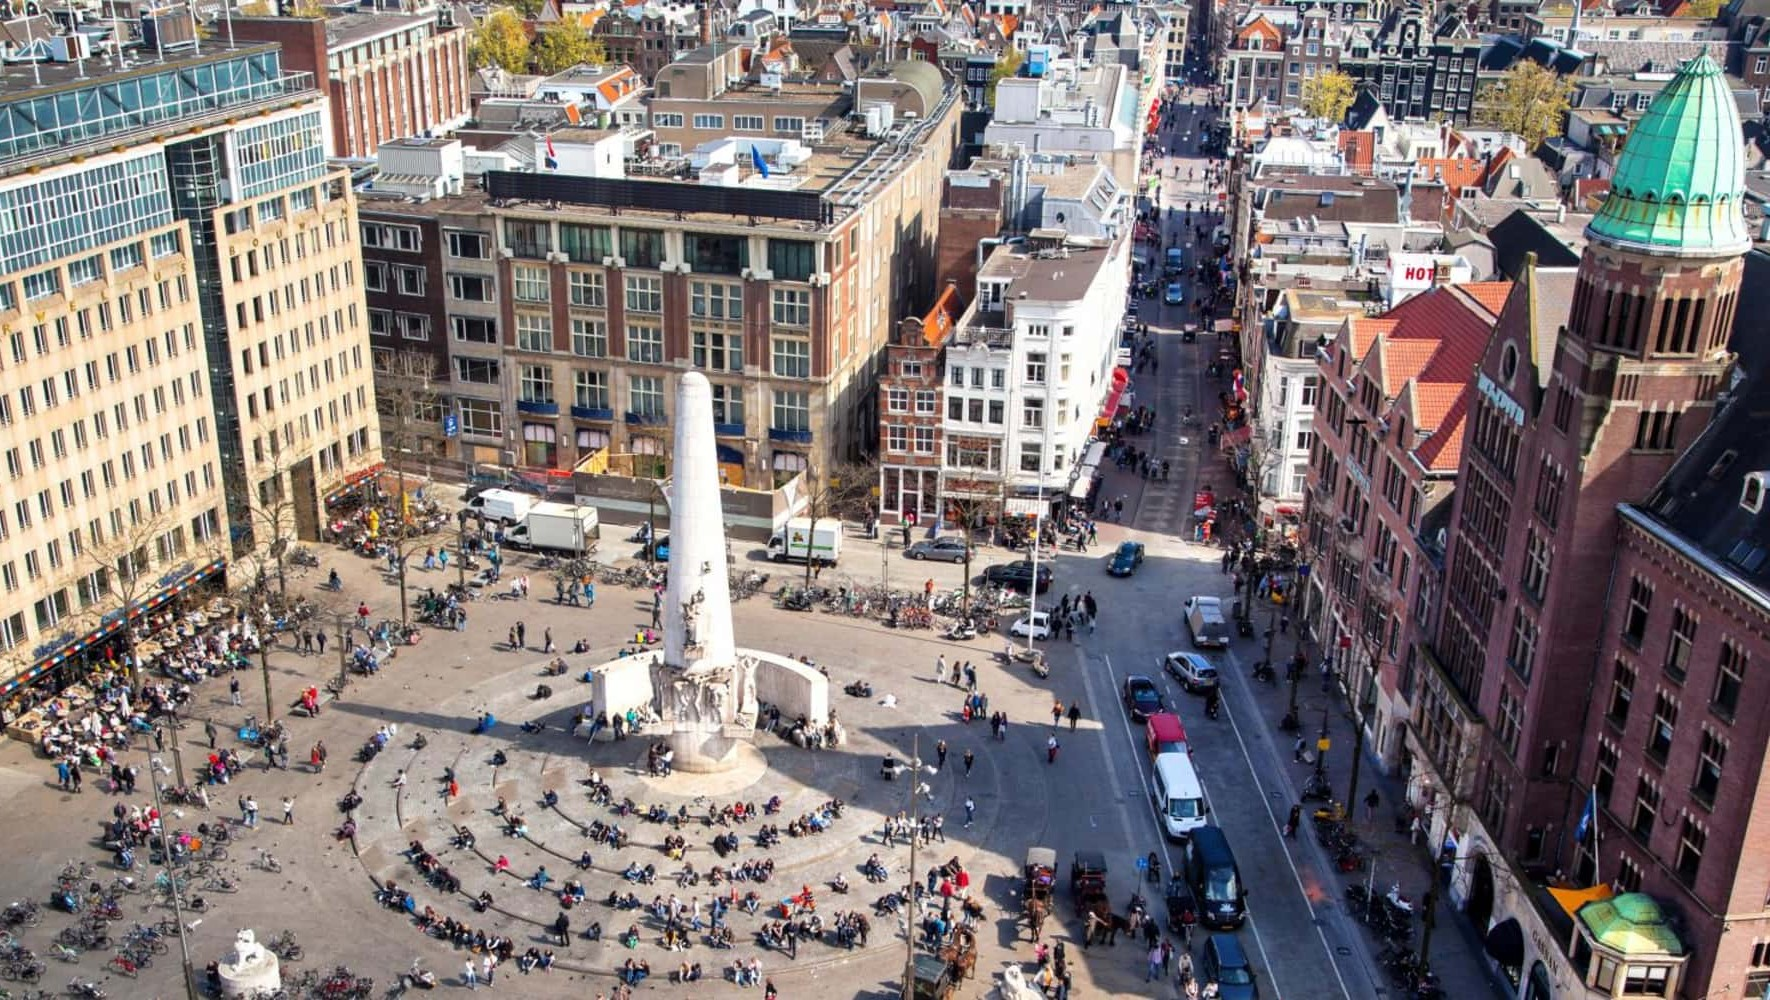 Amsterdam, luoghi di interesse: Piazza Dam, Amsterdam